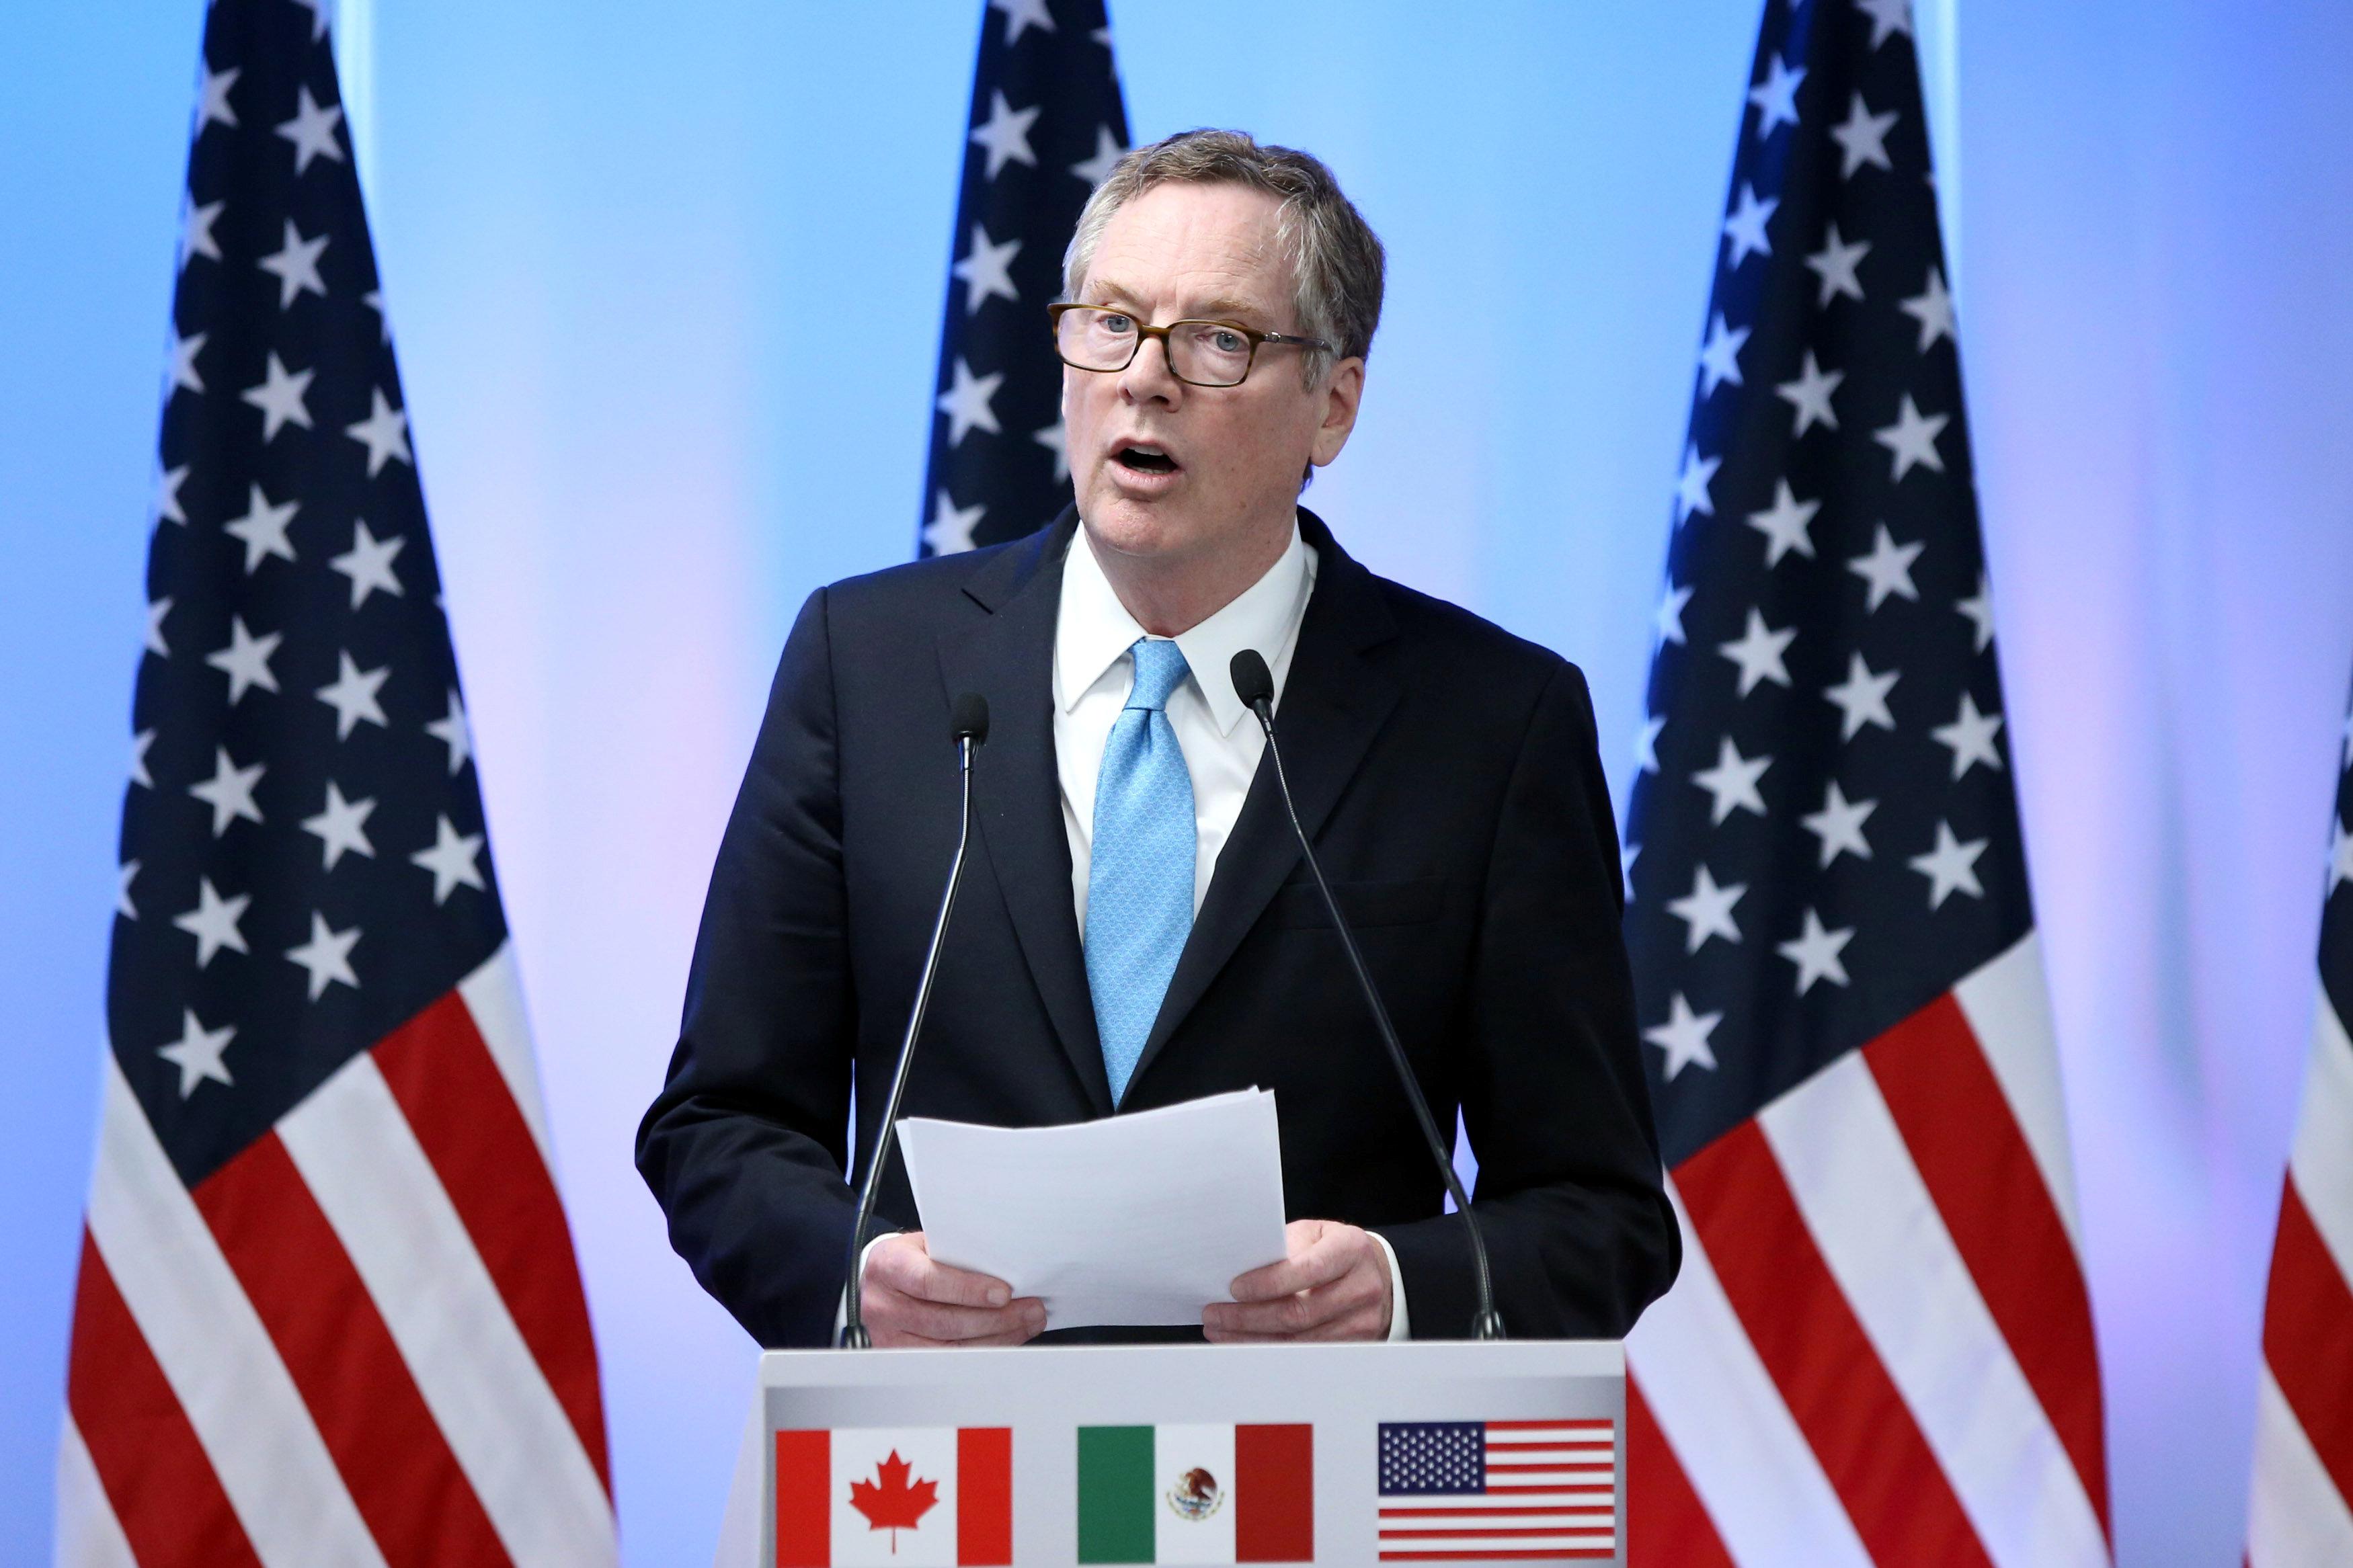 US Trade Representative keeps Trump's views in mind in Nafta talks